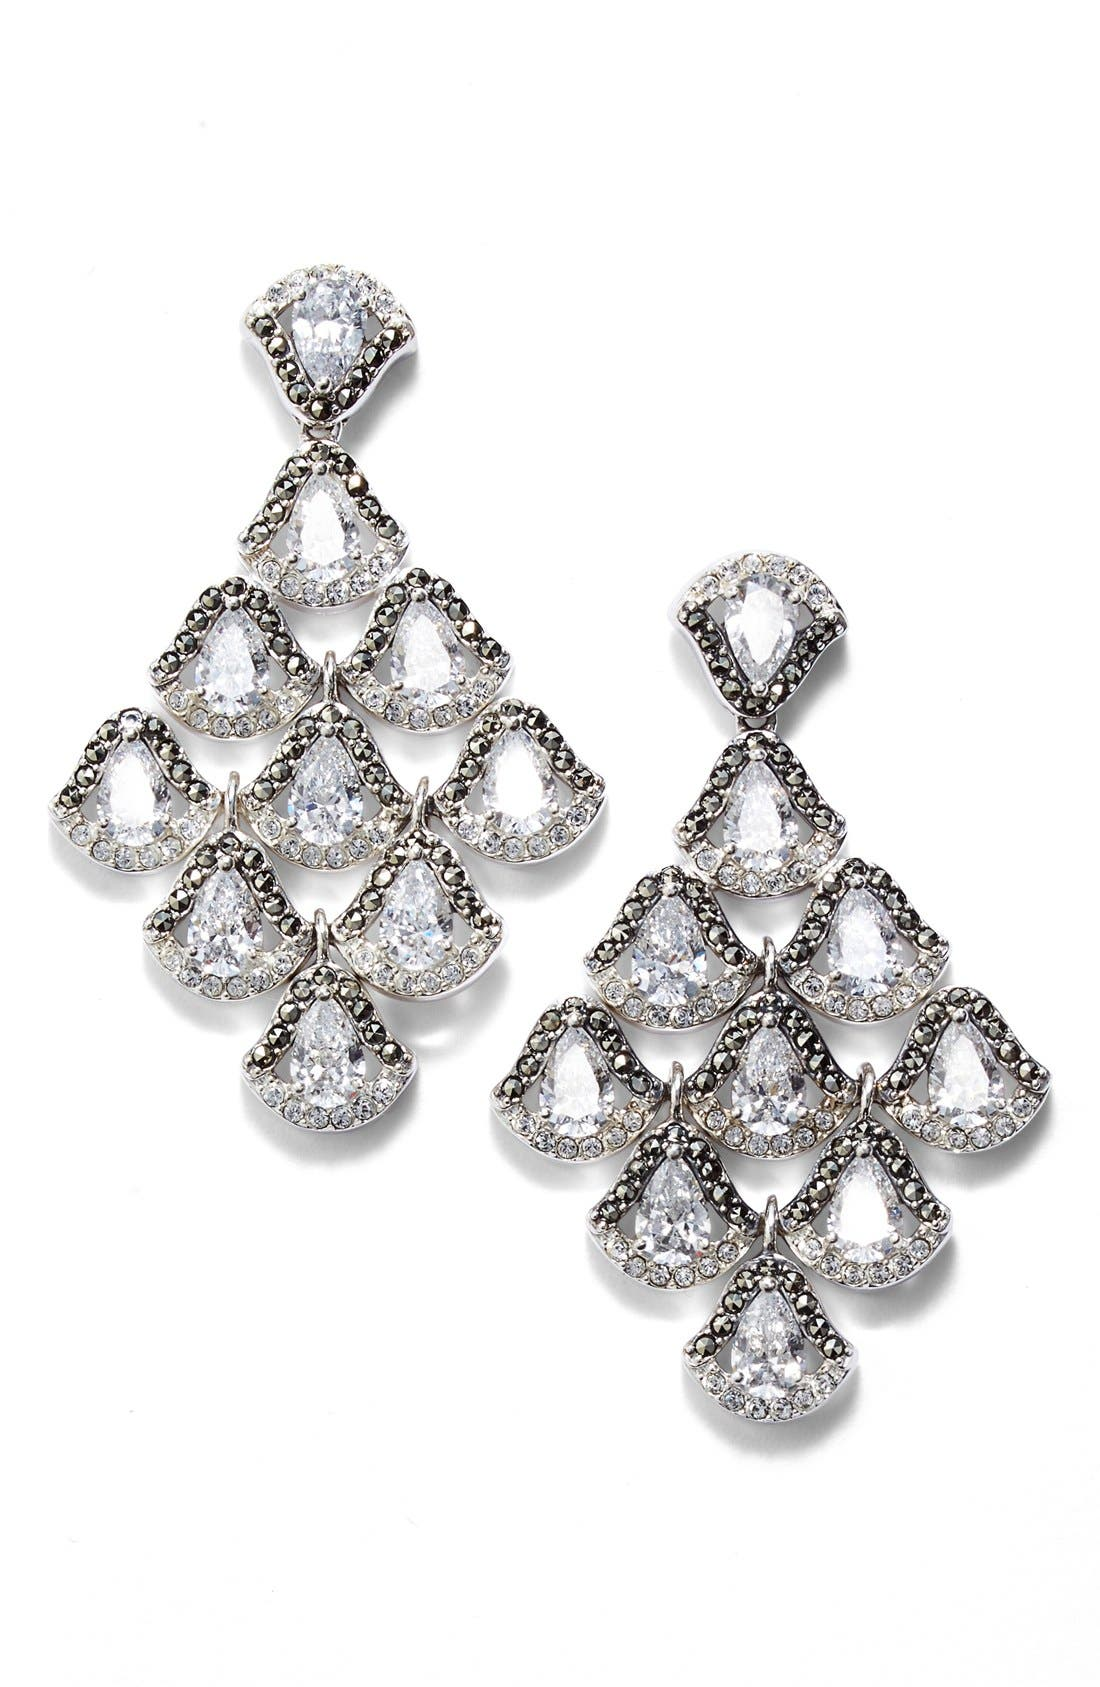 Semiprecious Stone Chandelier Earrings,                         Main,                         color, SILVER